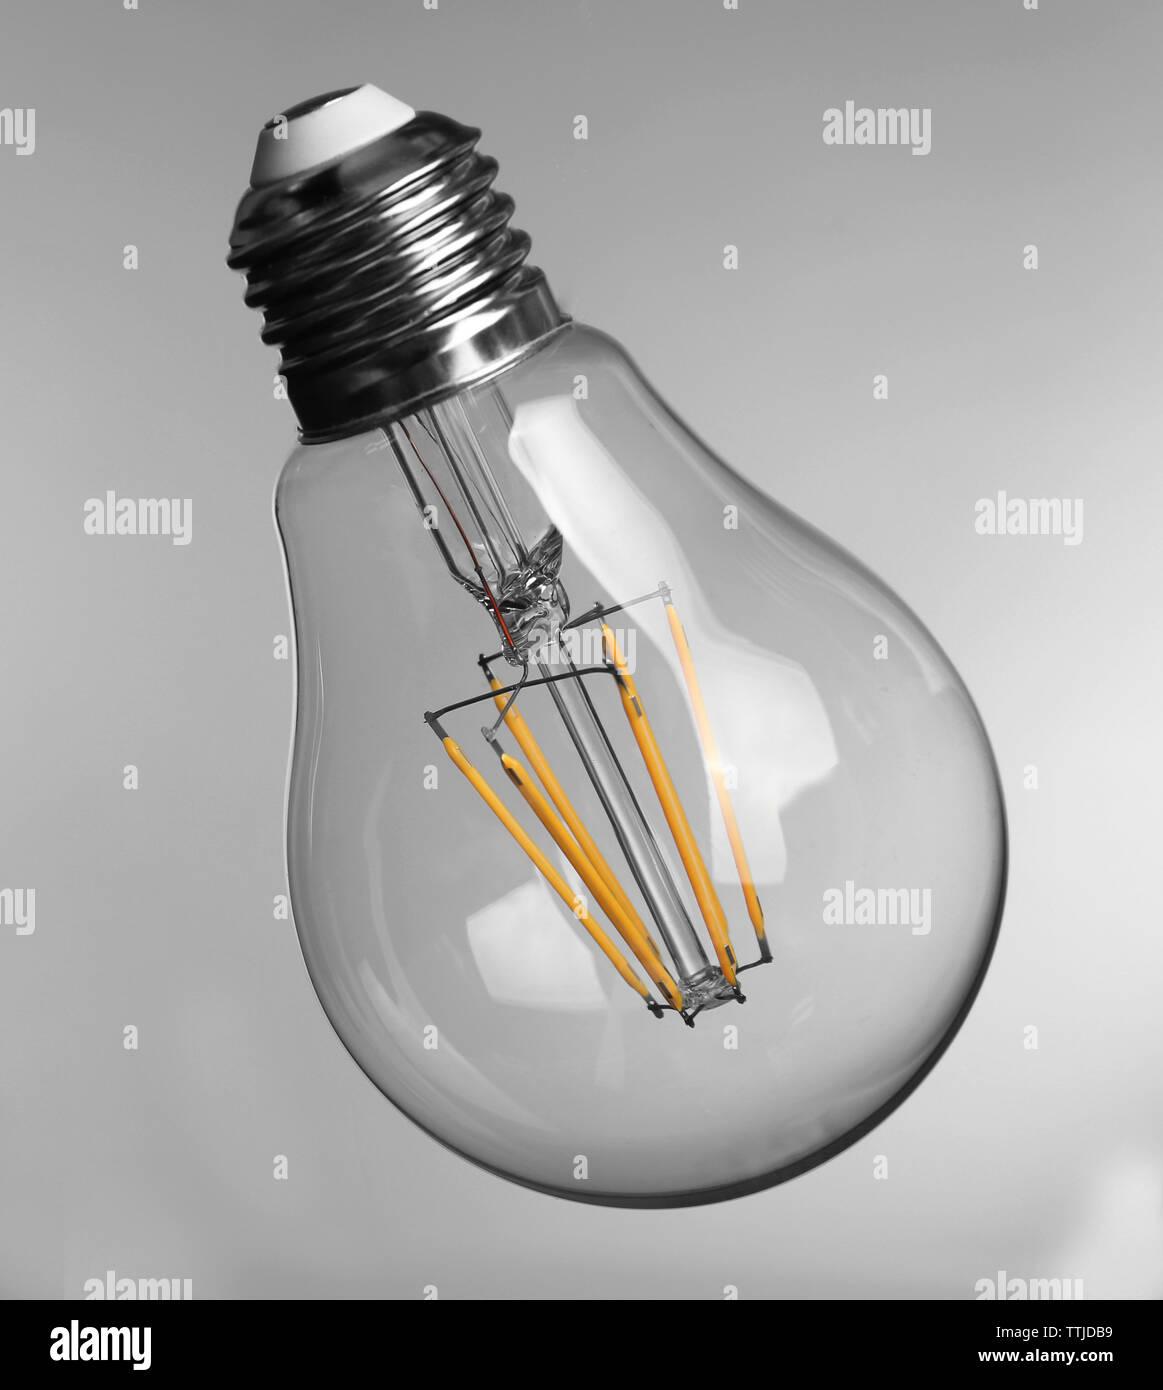 Light bulb on grey background - Stock Image